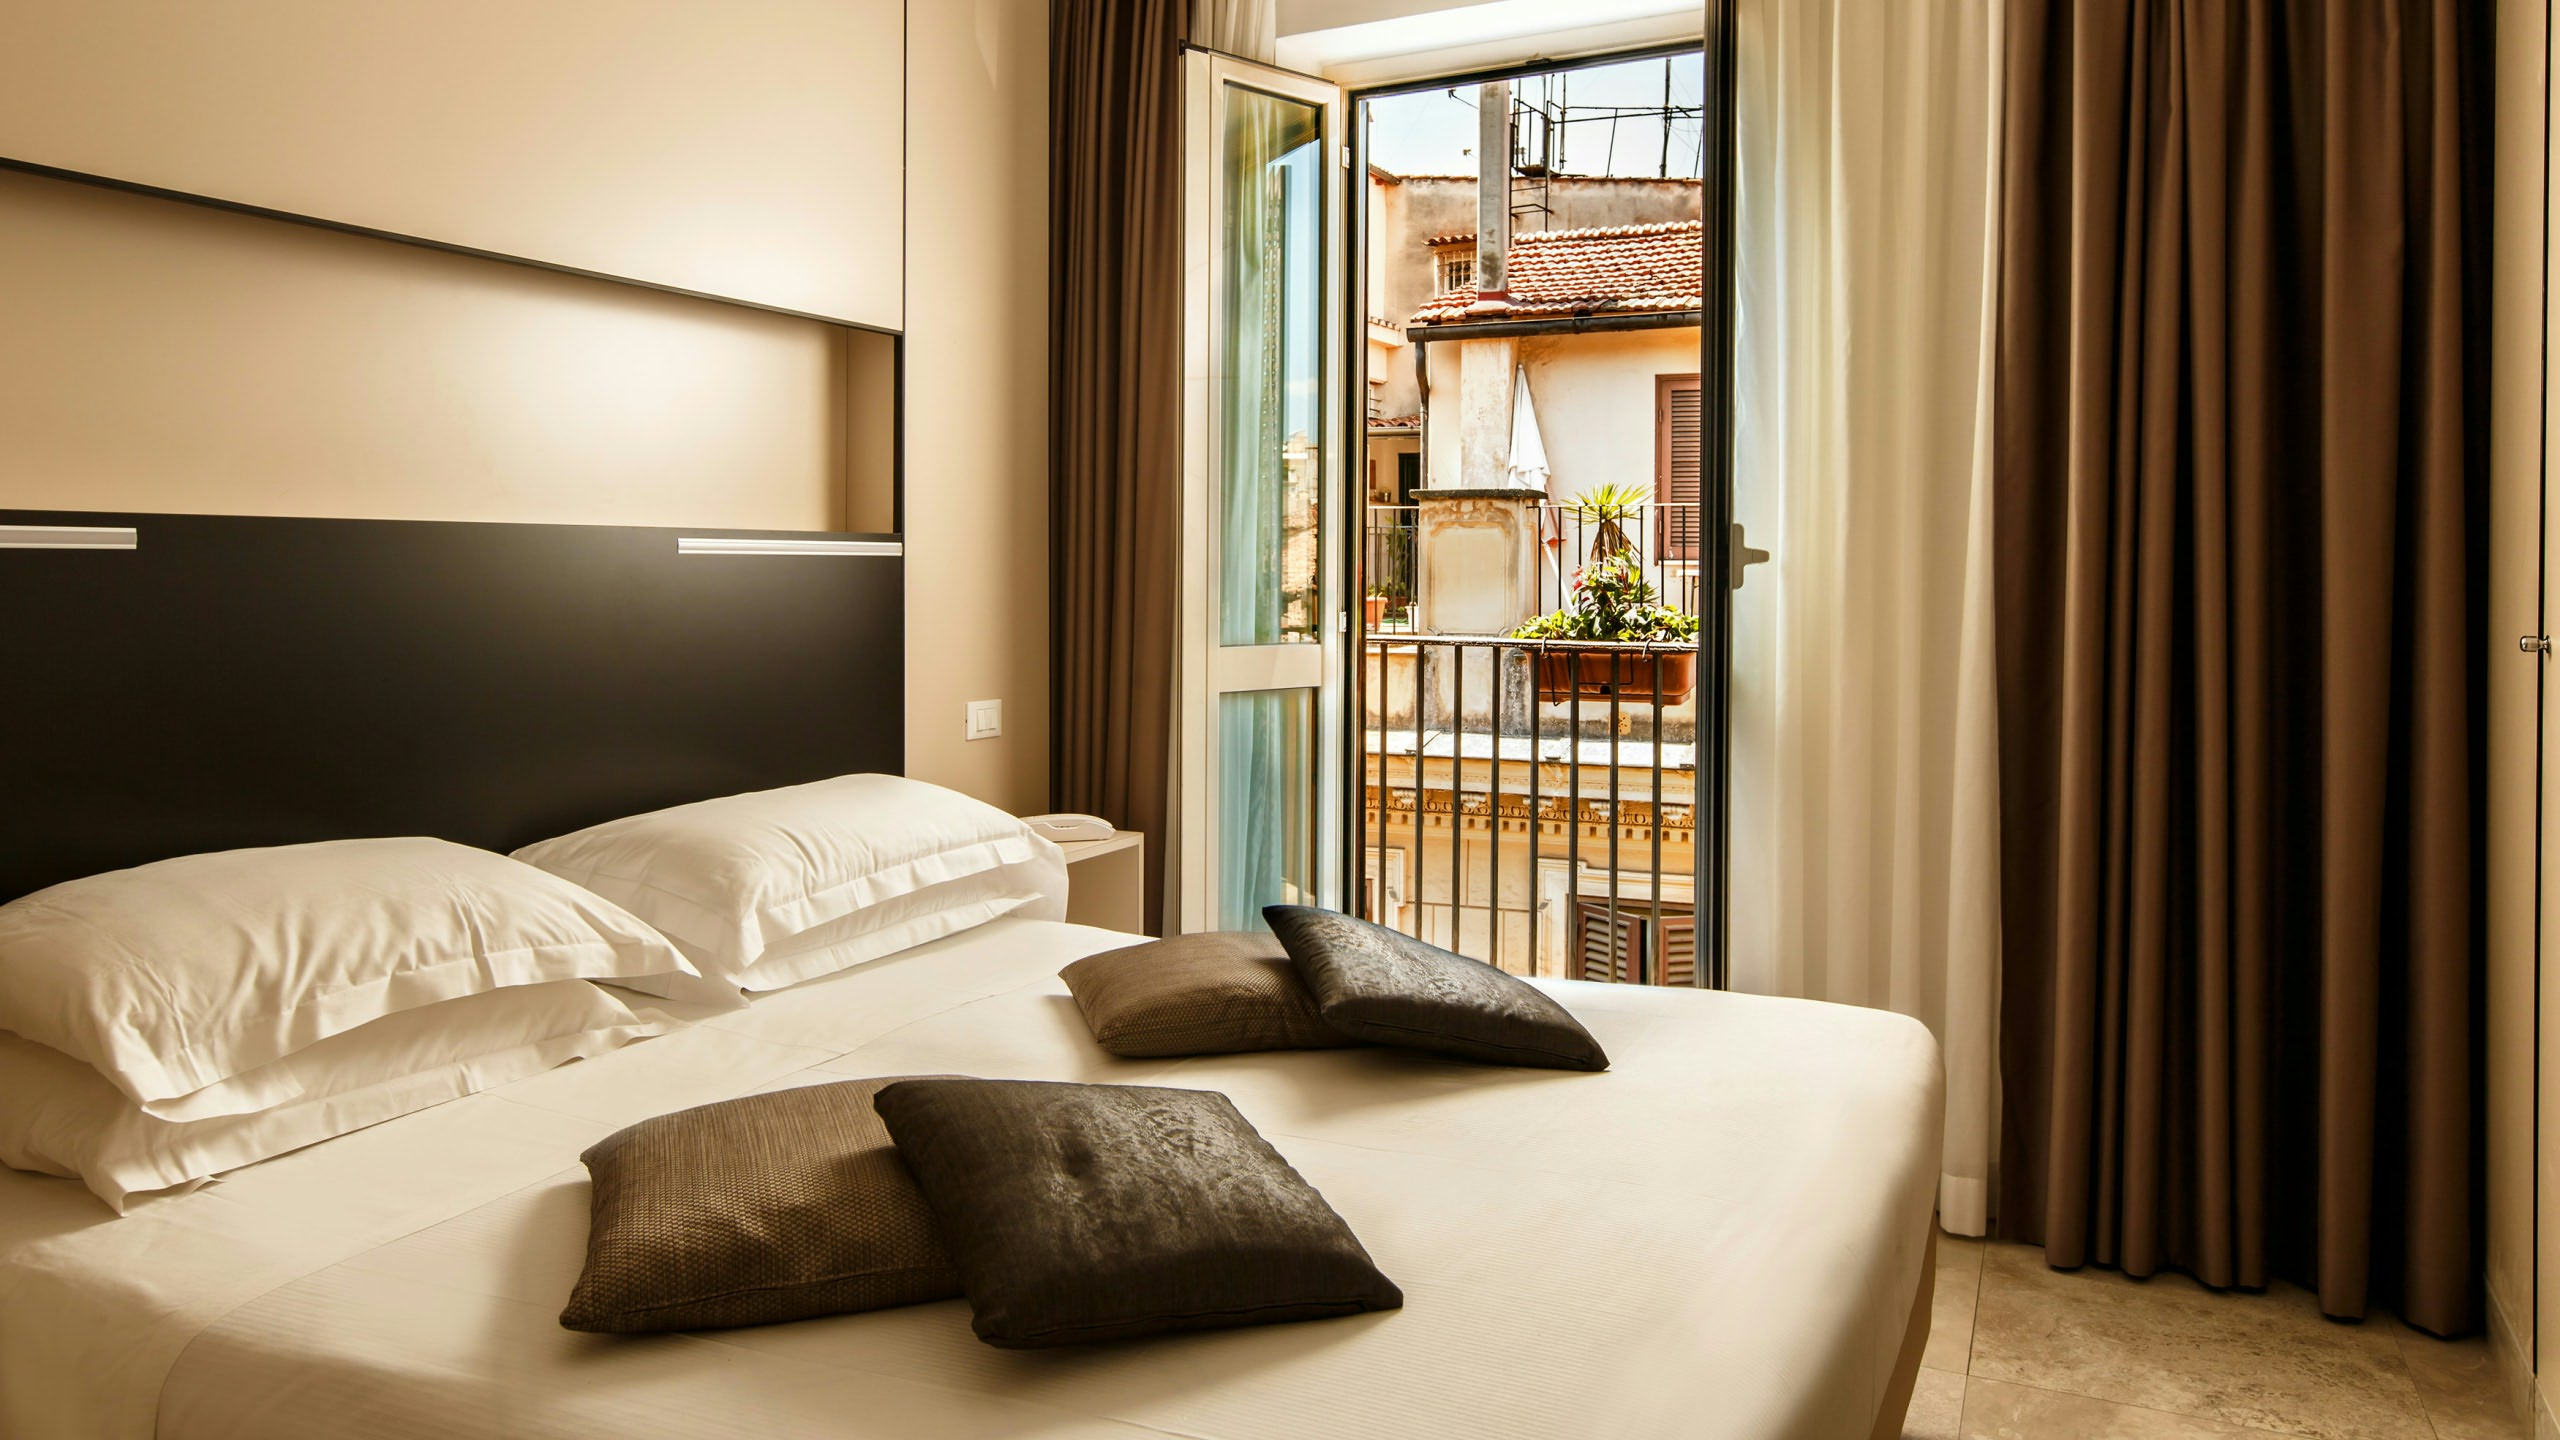 hotel-smeraldo-rom-slide3